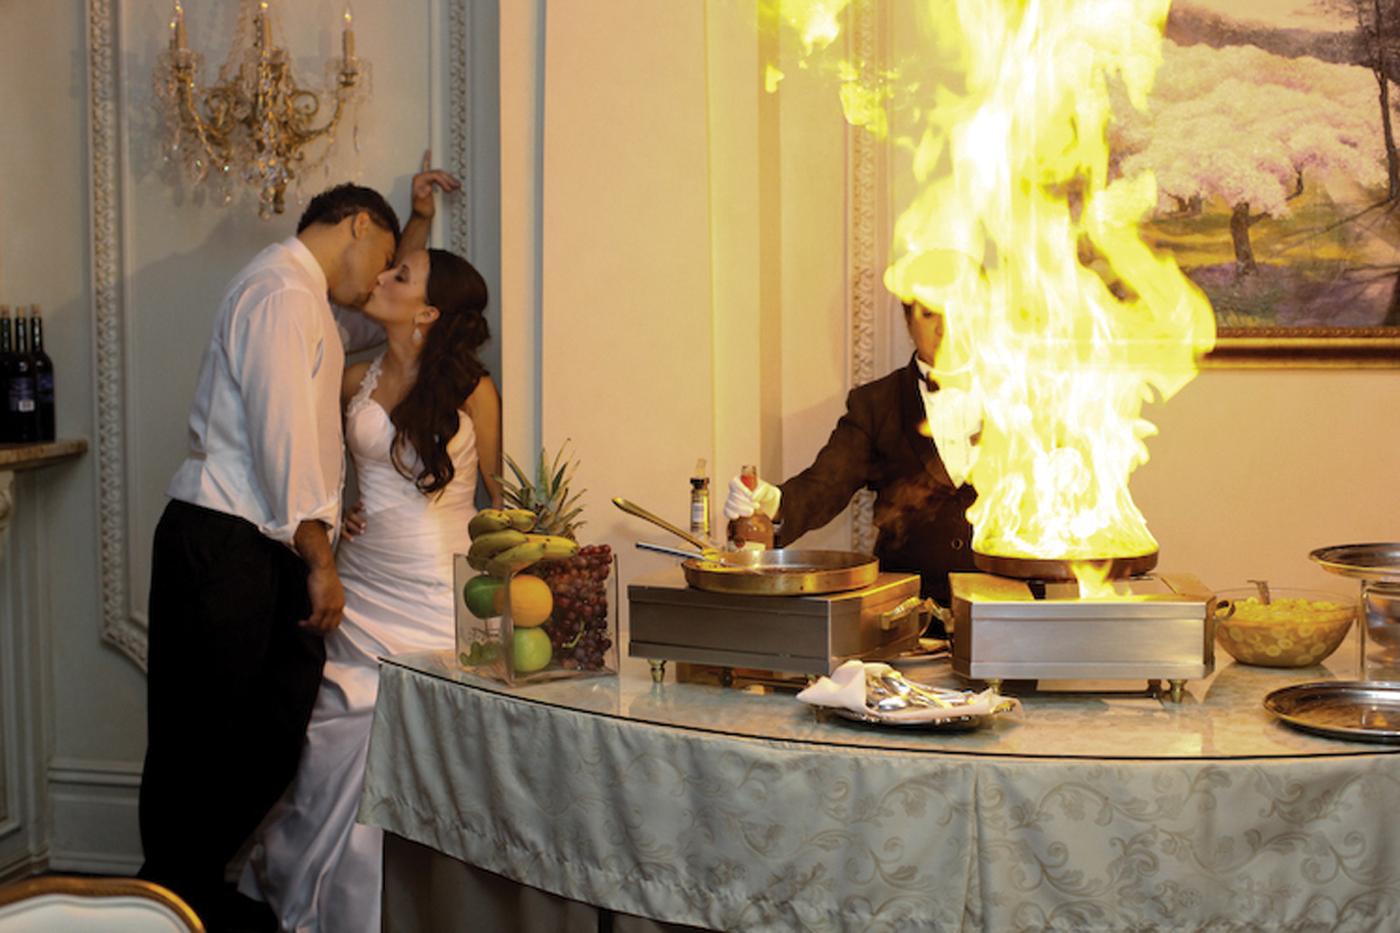 italian traditions traditional desserts flambe insights manhattanbride